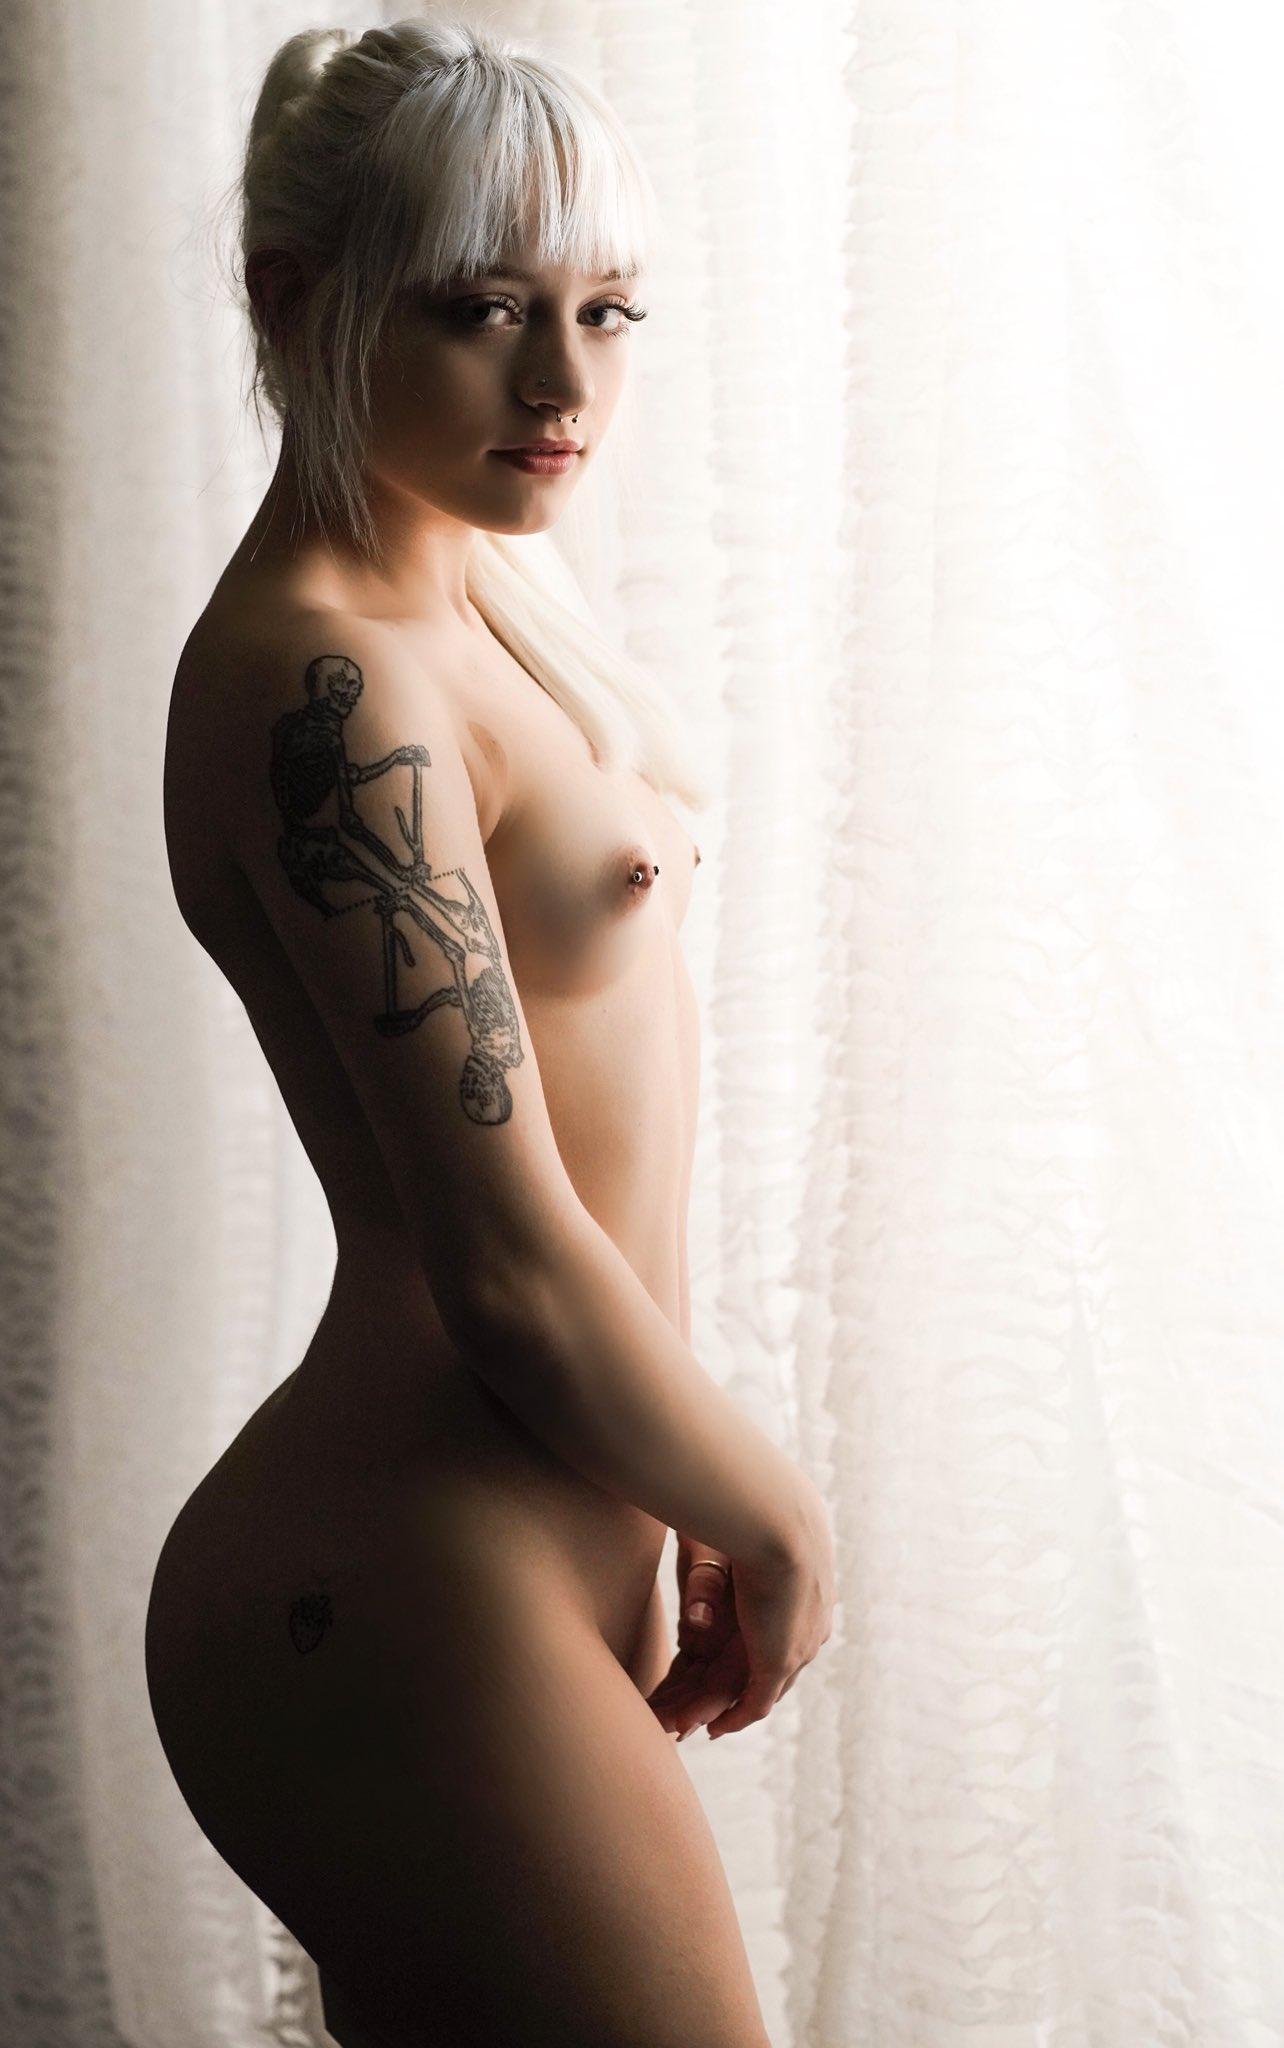 Naomi Nash